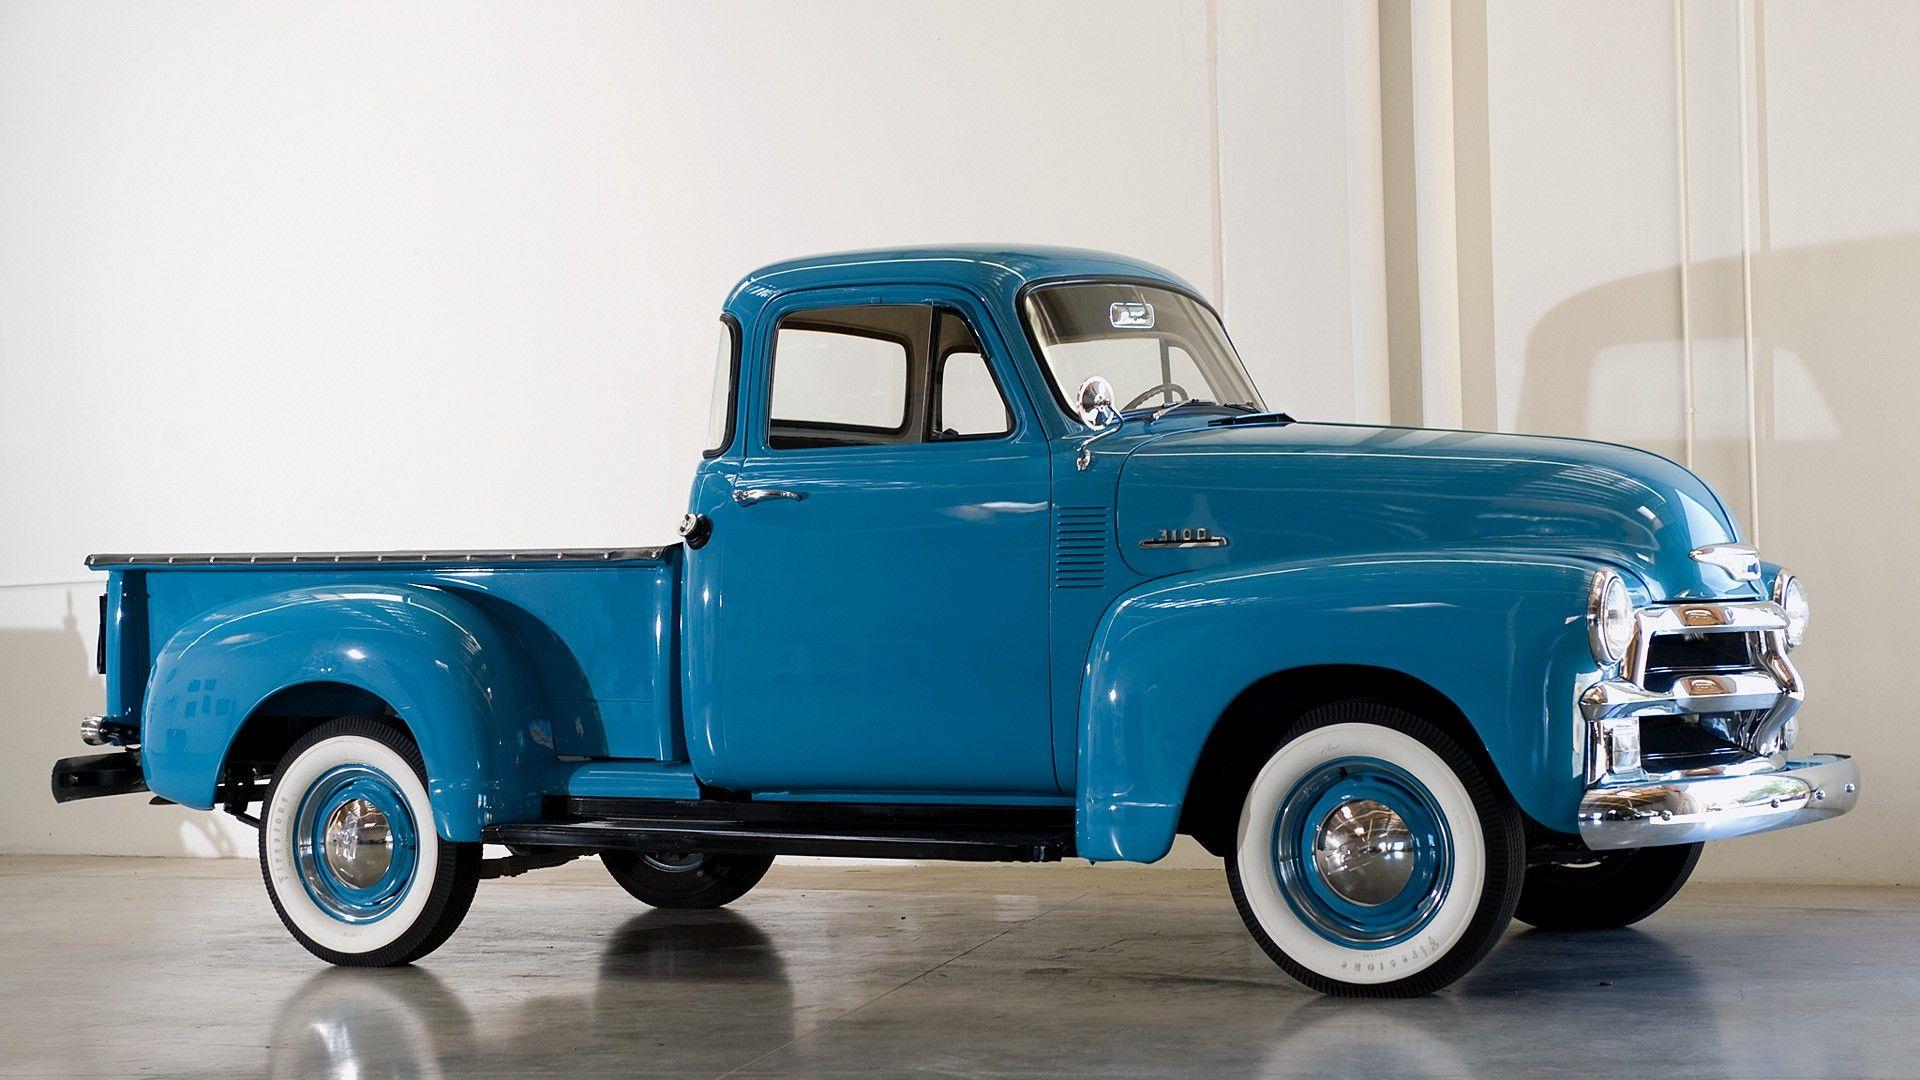 404 Not Found Classic Chevy Trucks Chevy Trucks 1954 Chevy Truck